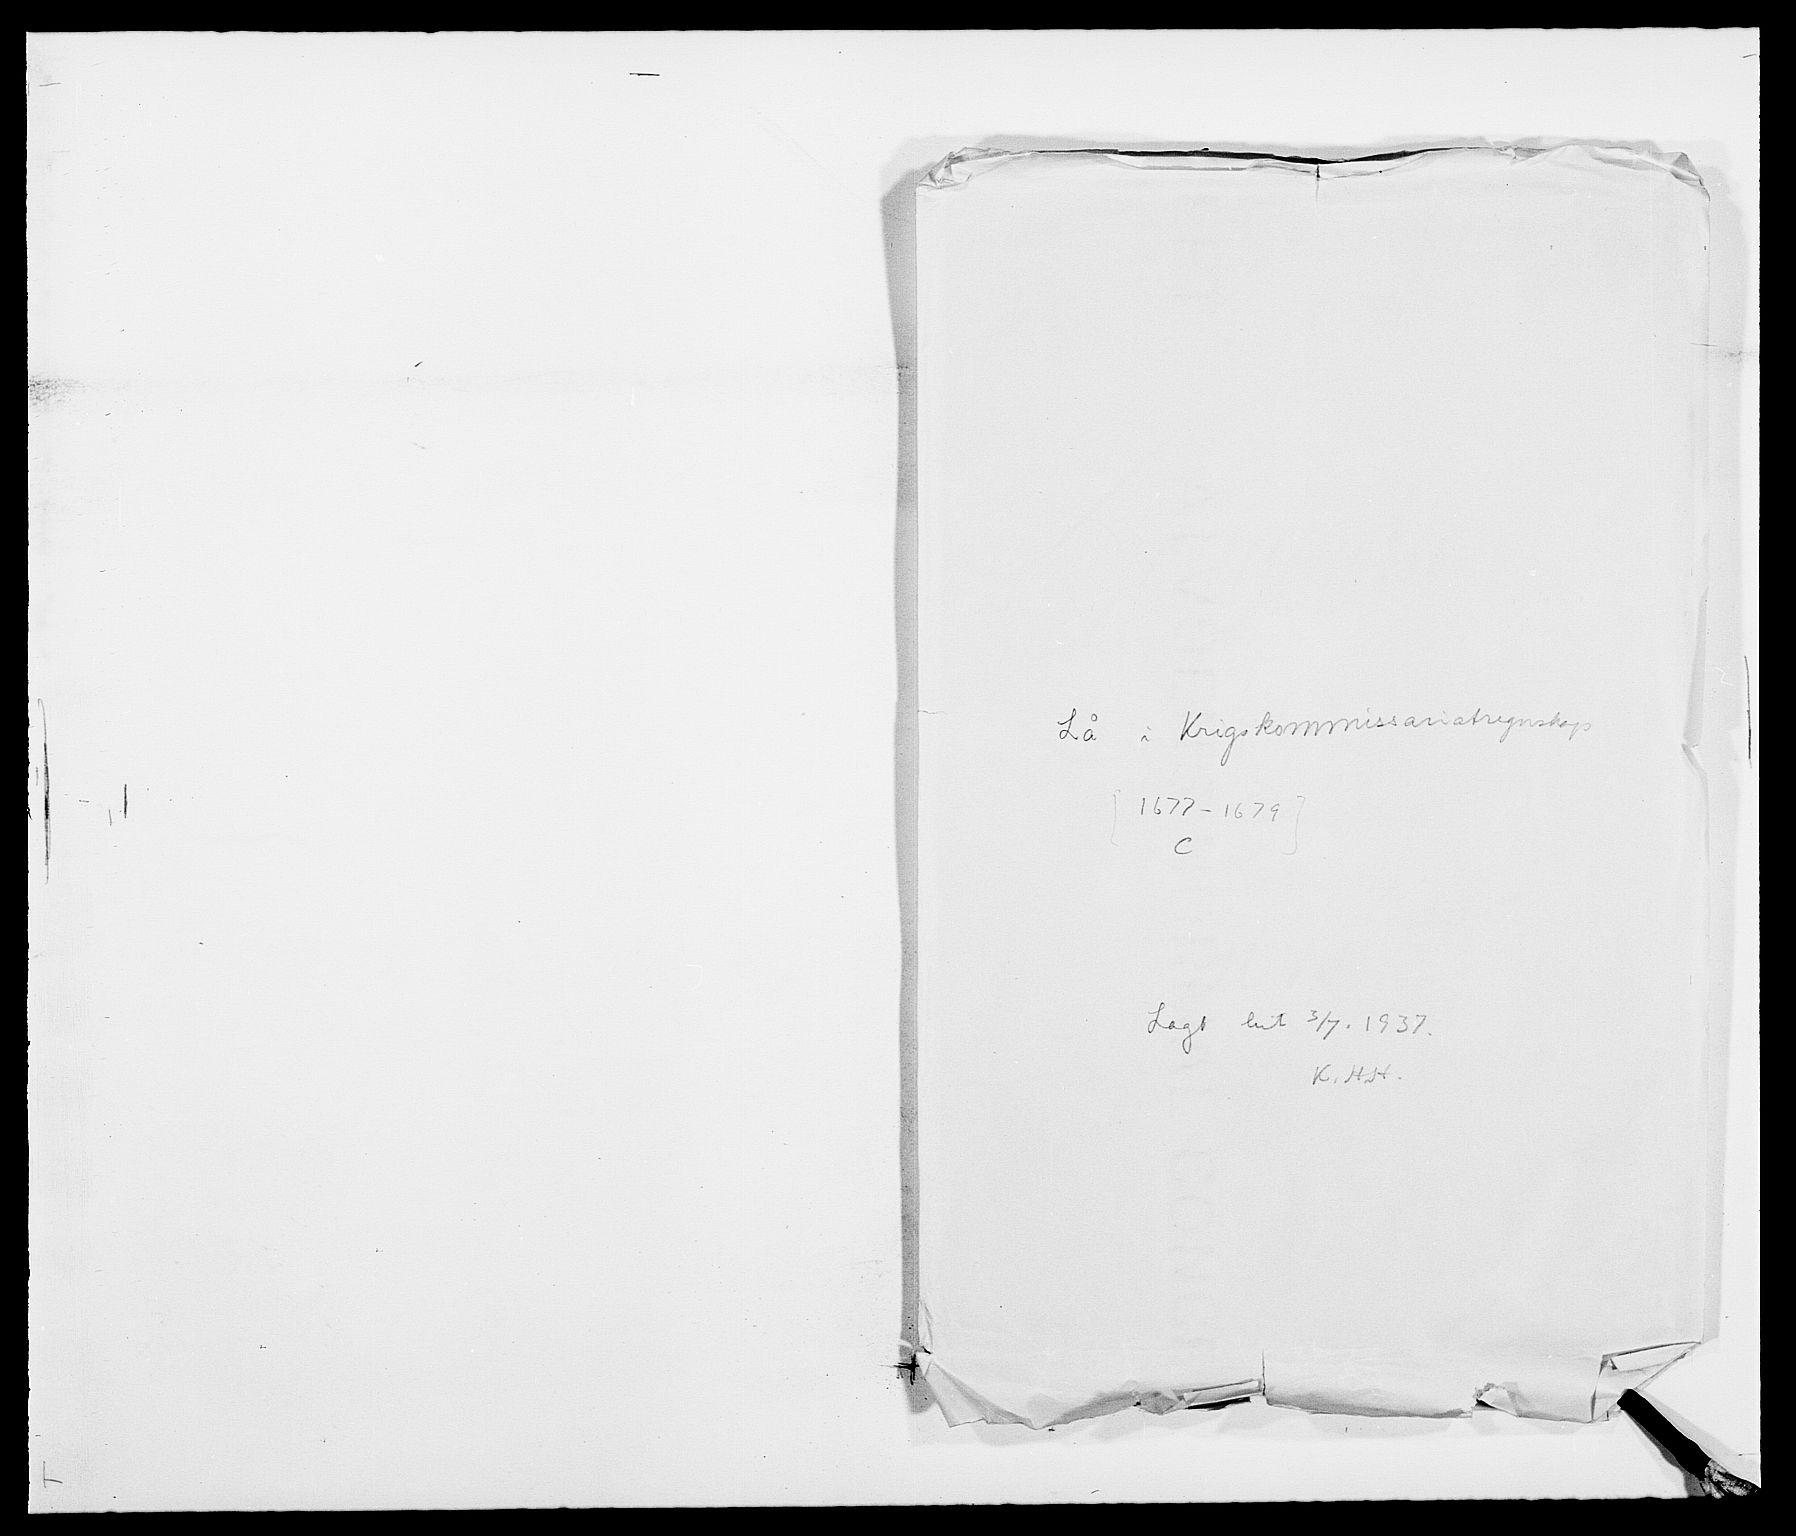 RA, Rentekammeret inntil 1814, Reviderte regnskaper, Fogderegnskap, R32/L1845: Fogderegnskap Jarlsberg grevskap, 1676-1678, s. 380